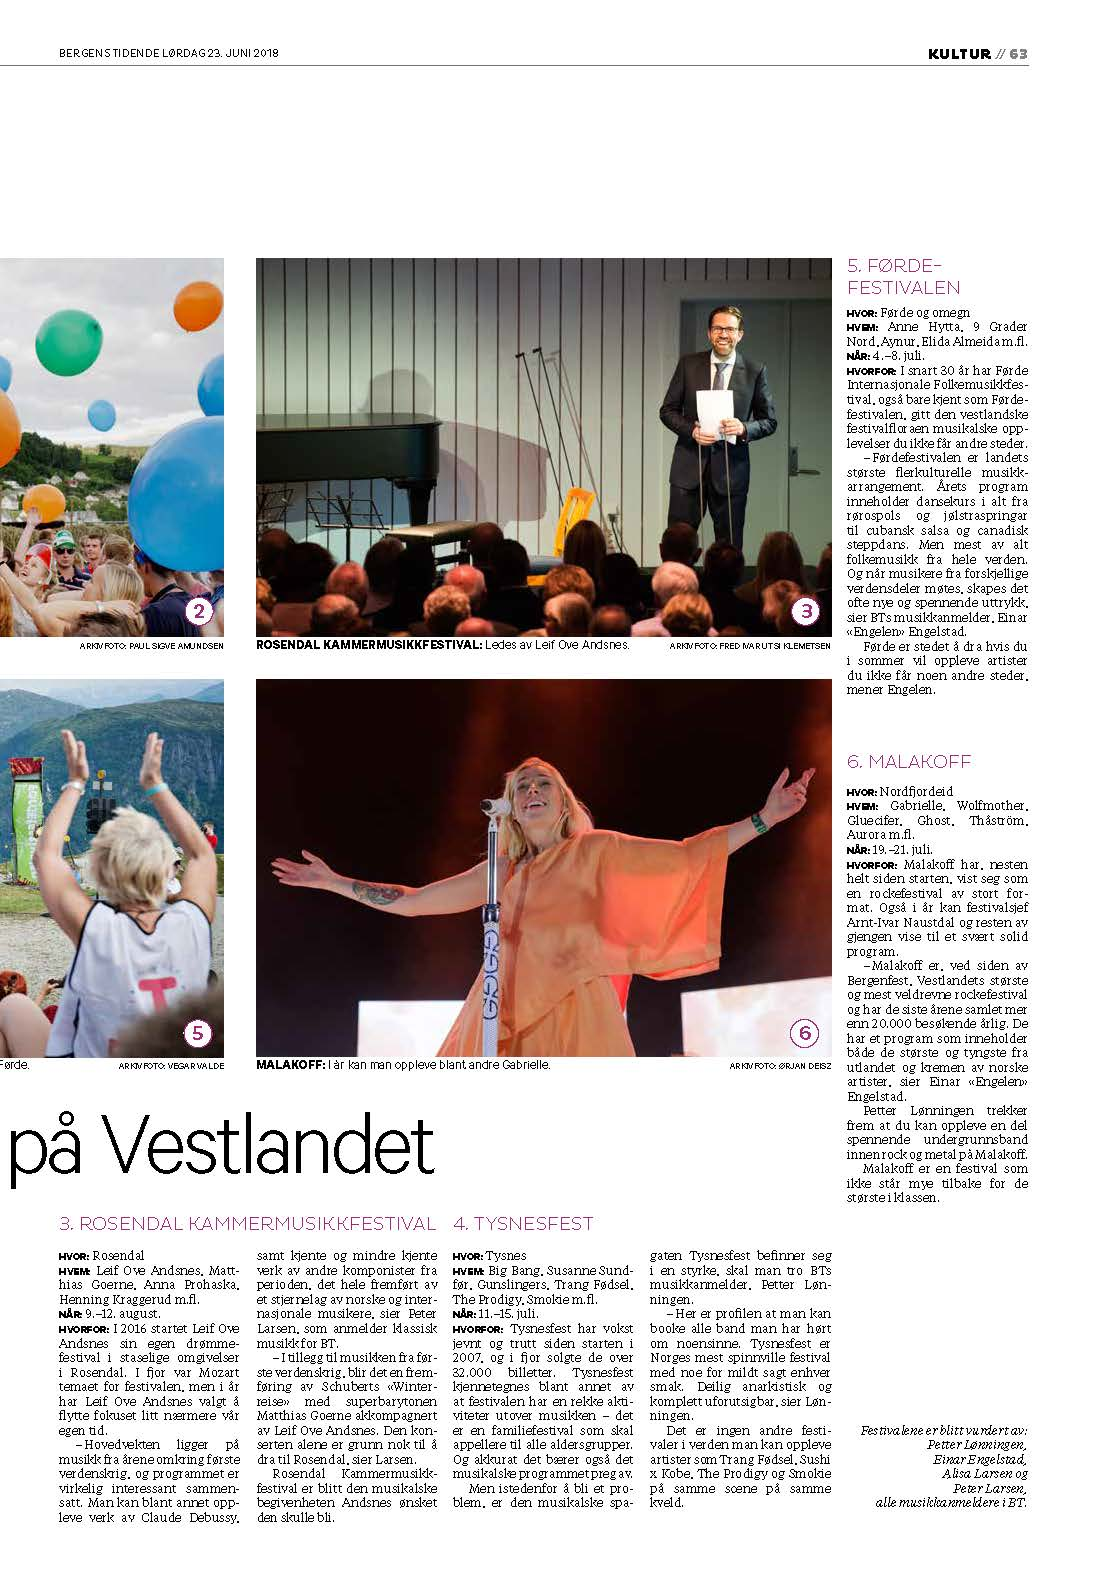 Bergens-Tidende-2018-06-23-side-63.jpg